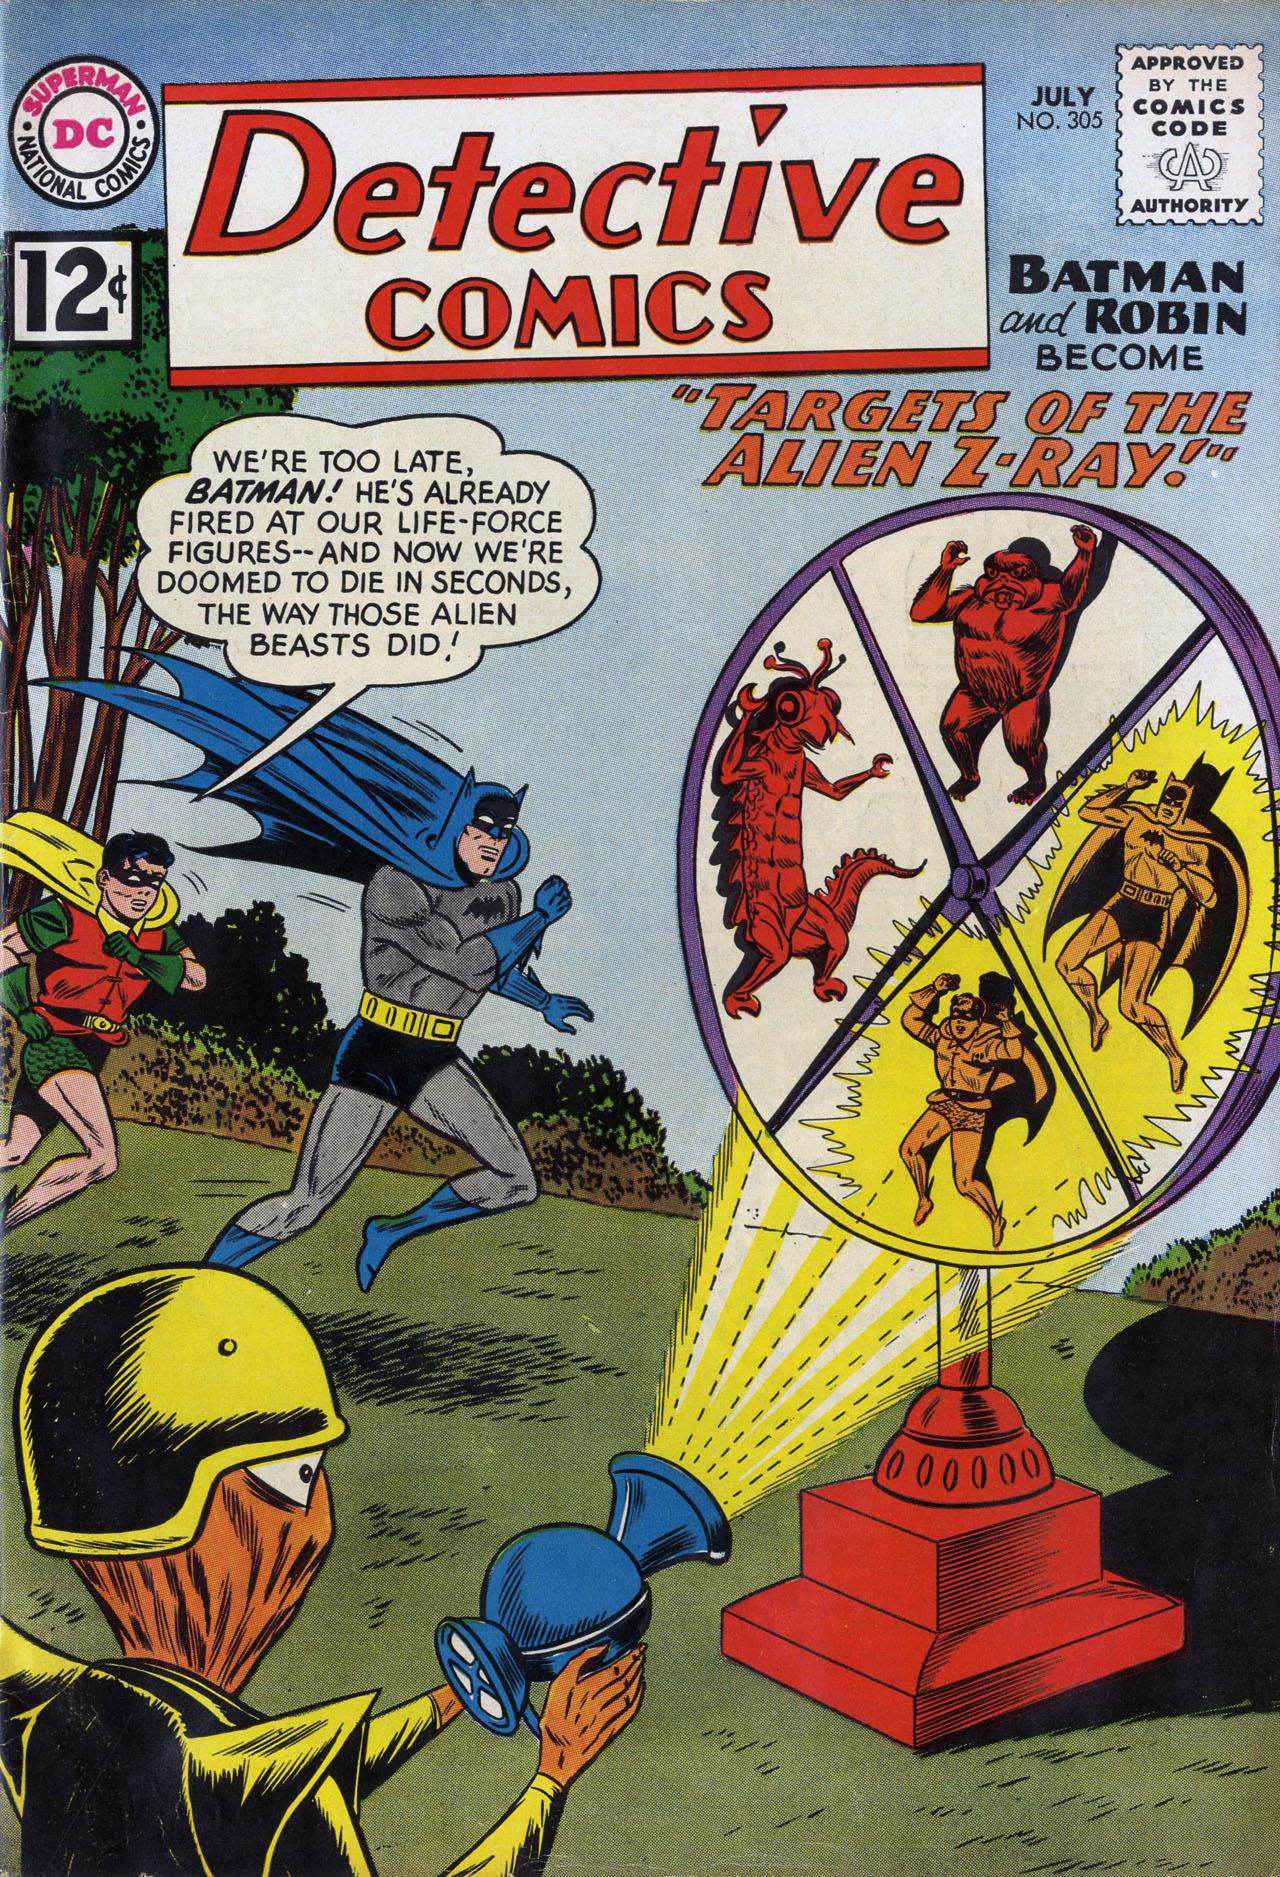 Detective Comics (1937) 305 Page 1